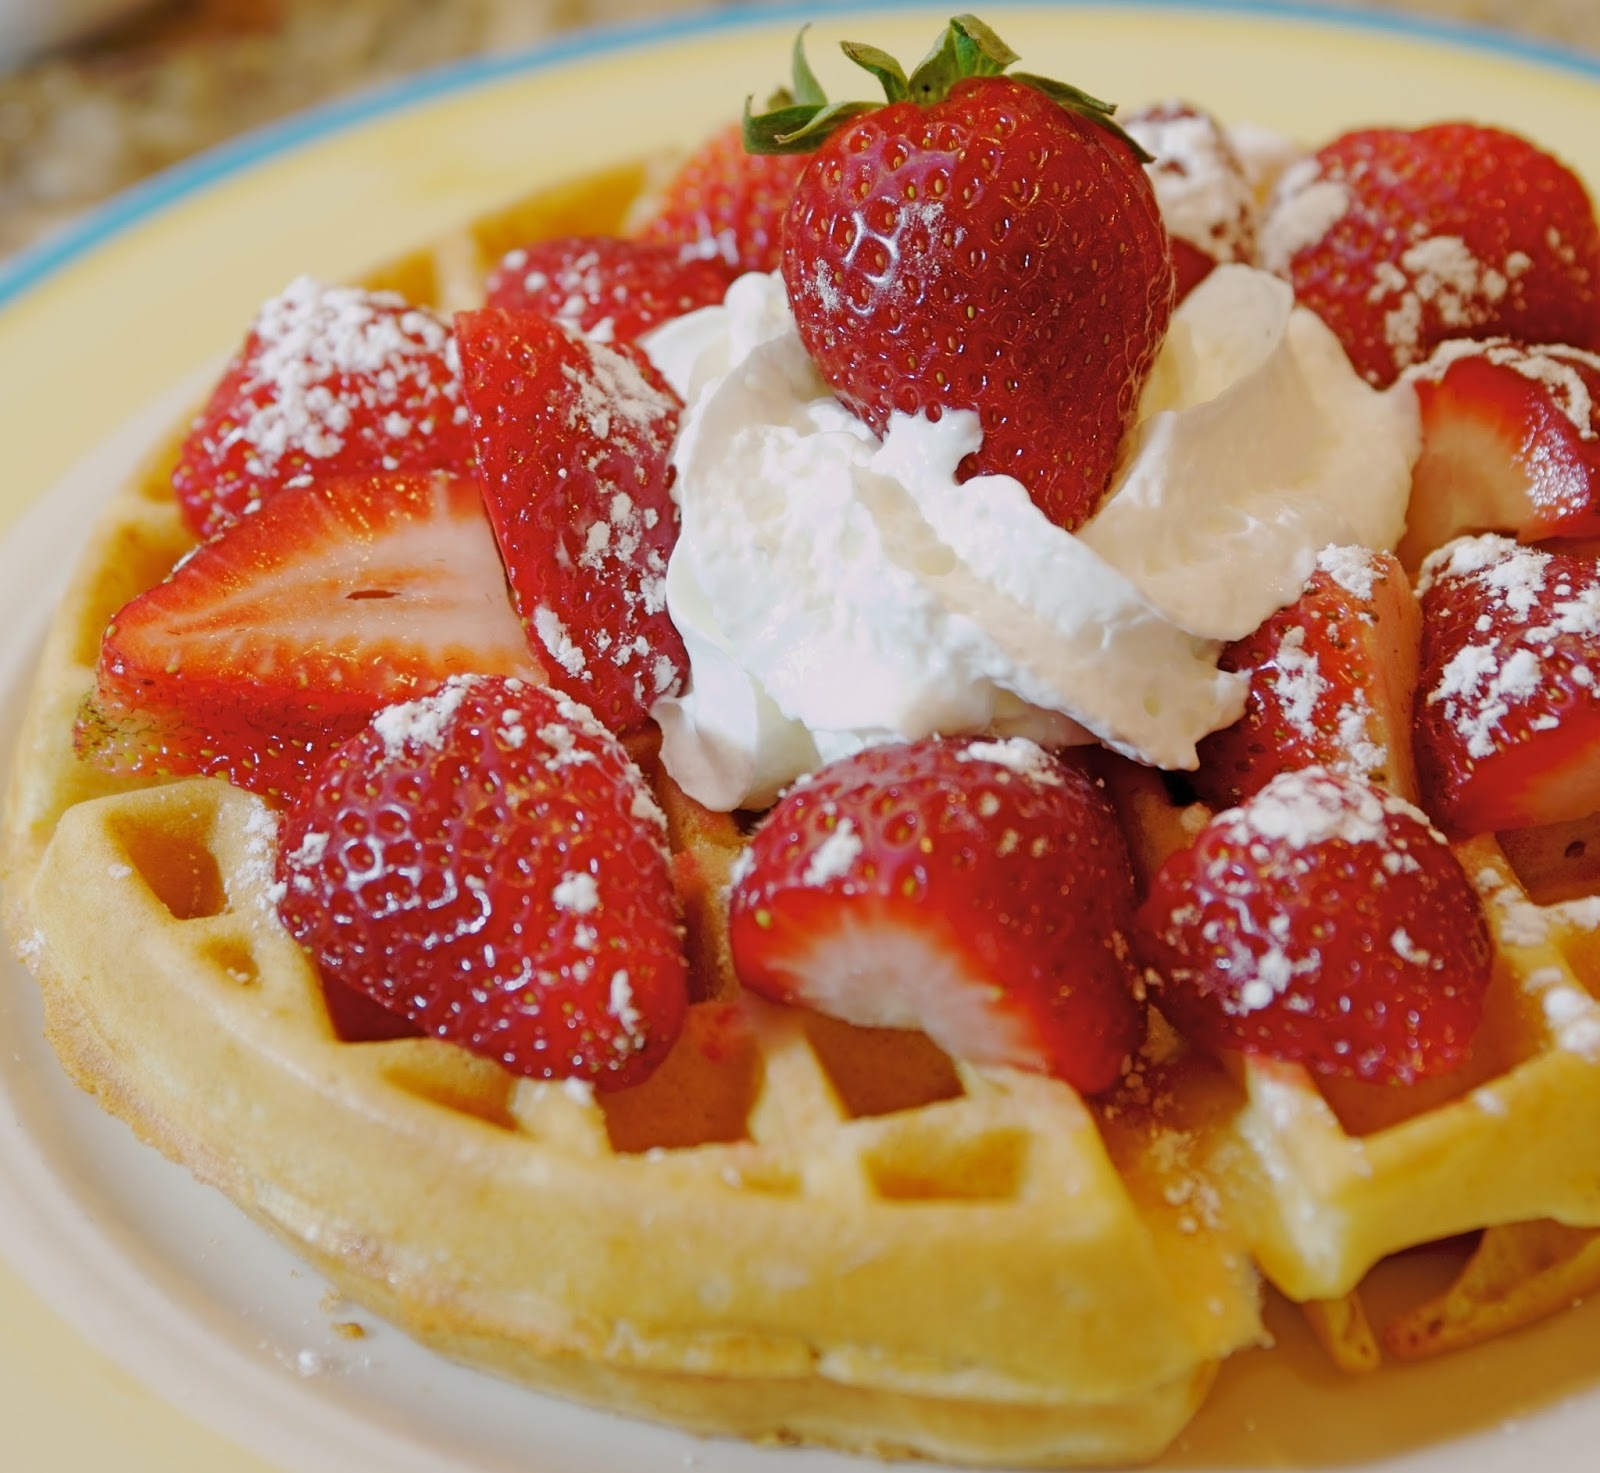 Molly's Recipes: Sour Cream Waffles